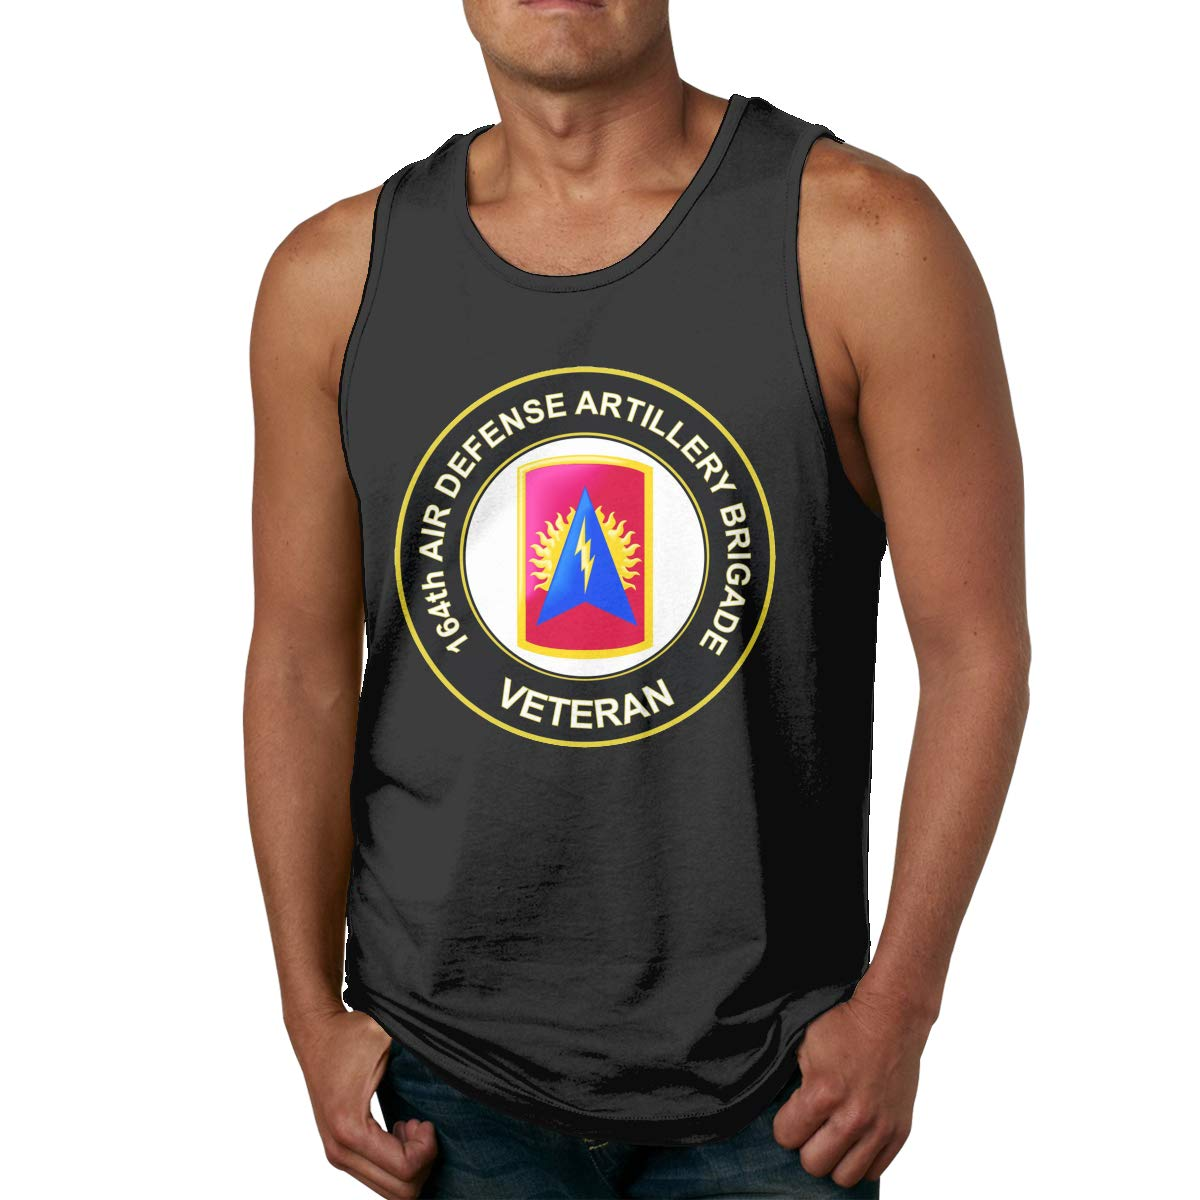 BGFYJN U.S Army 164th Air Defense Artillery Brigade Veteran Mens Cotton Undershirts Crew Neck Tank Tops